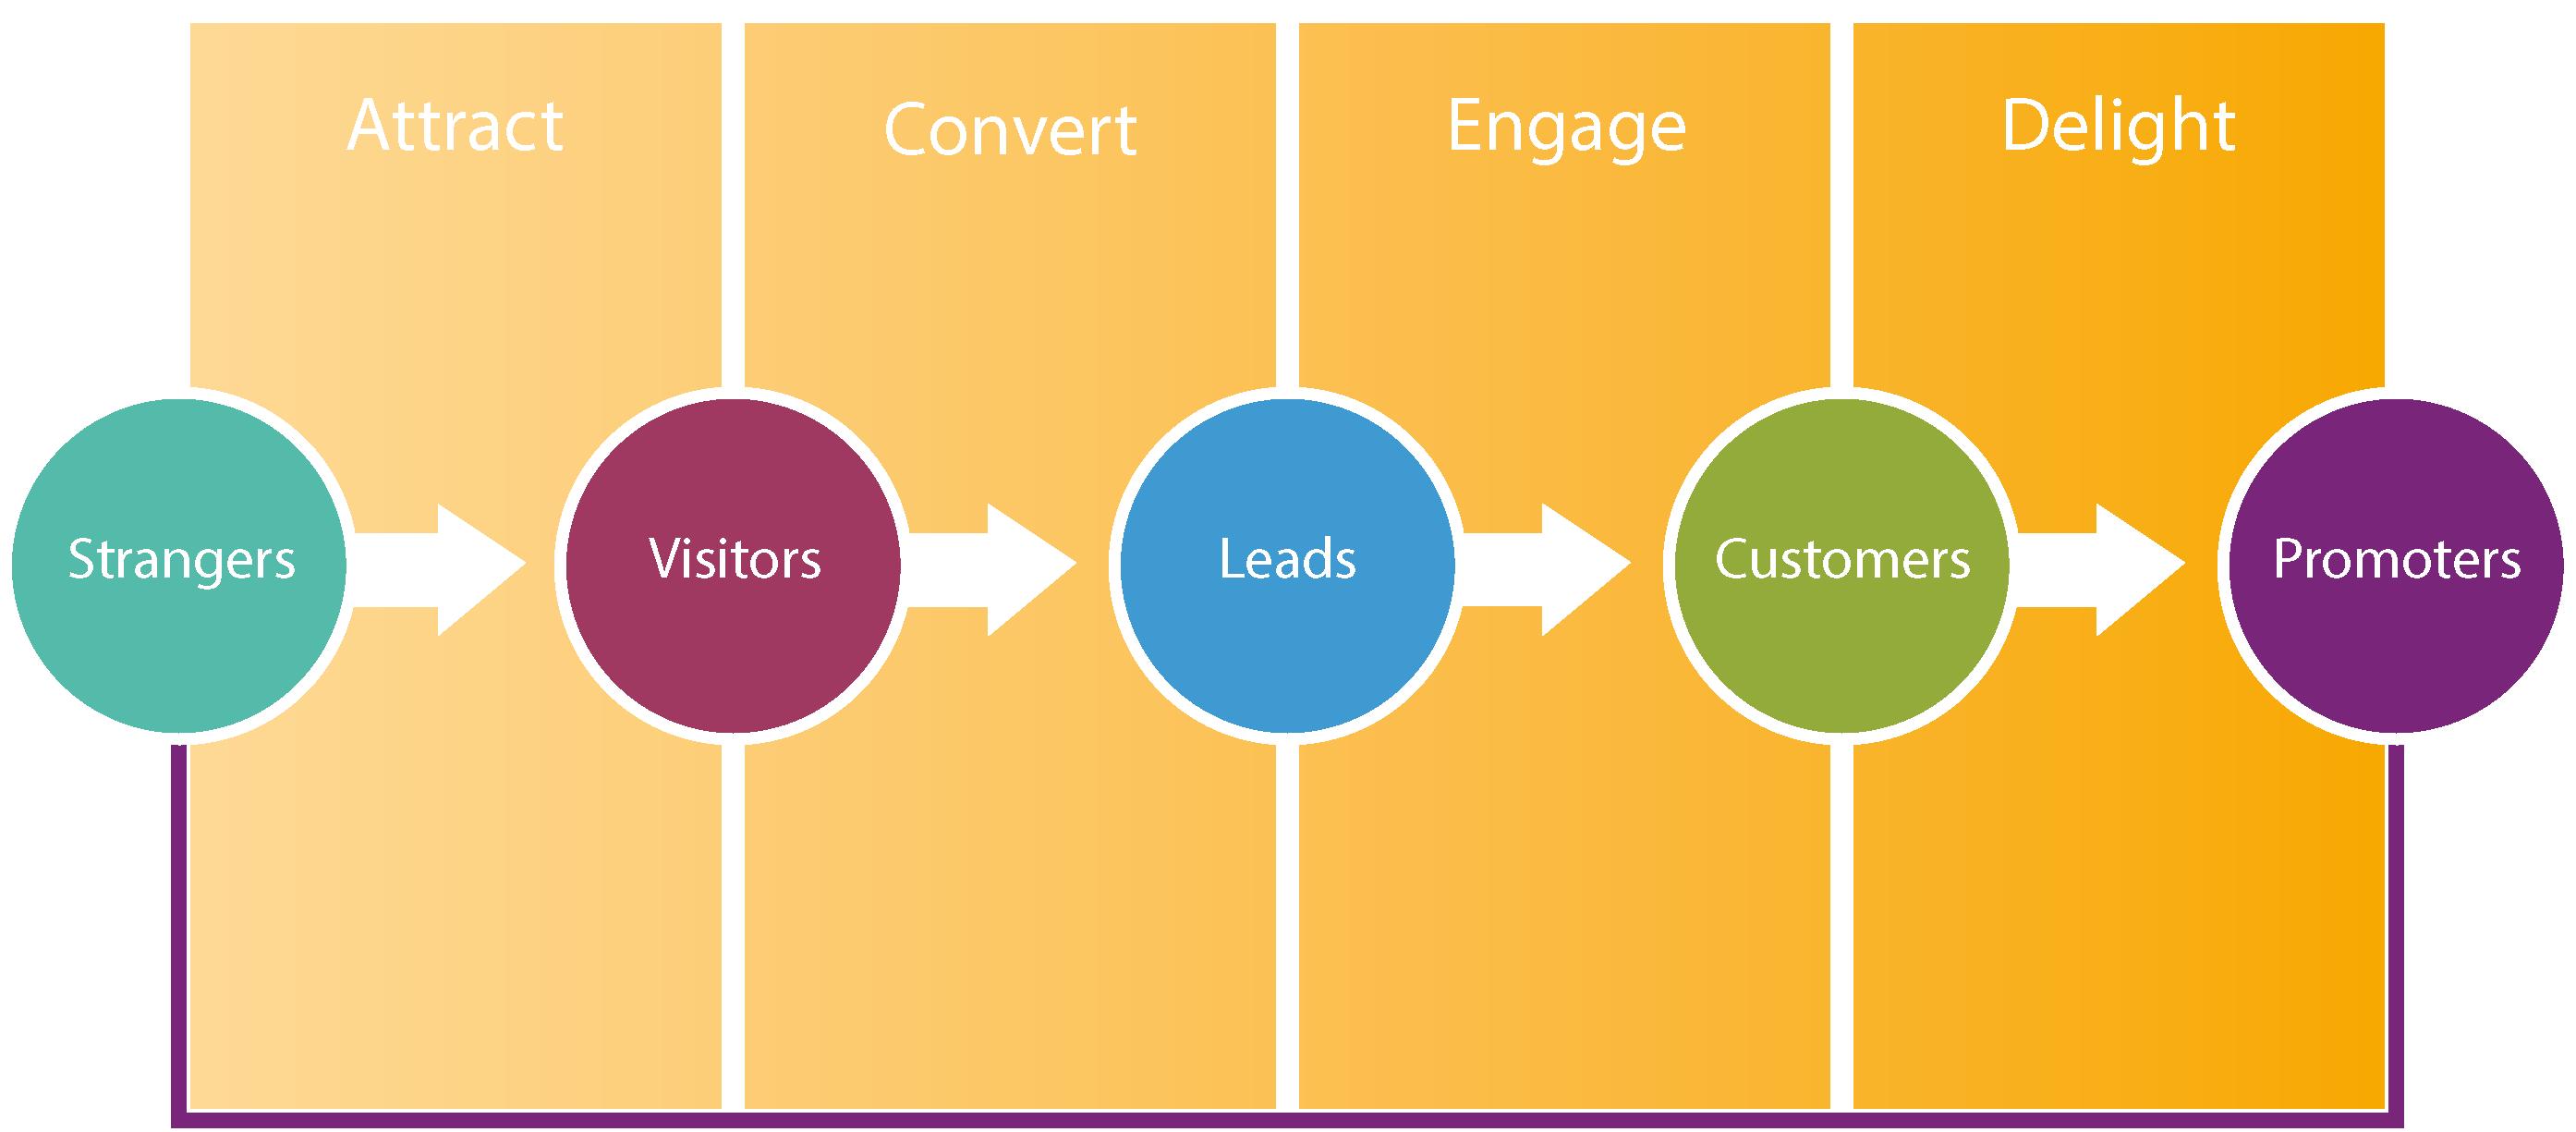 HubSpot Automated Marketing Inbound Methodology